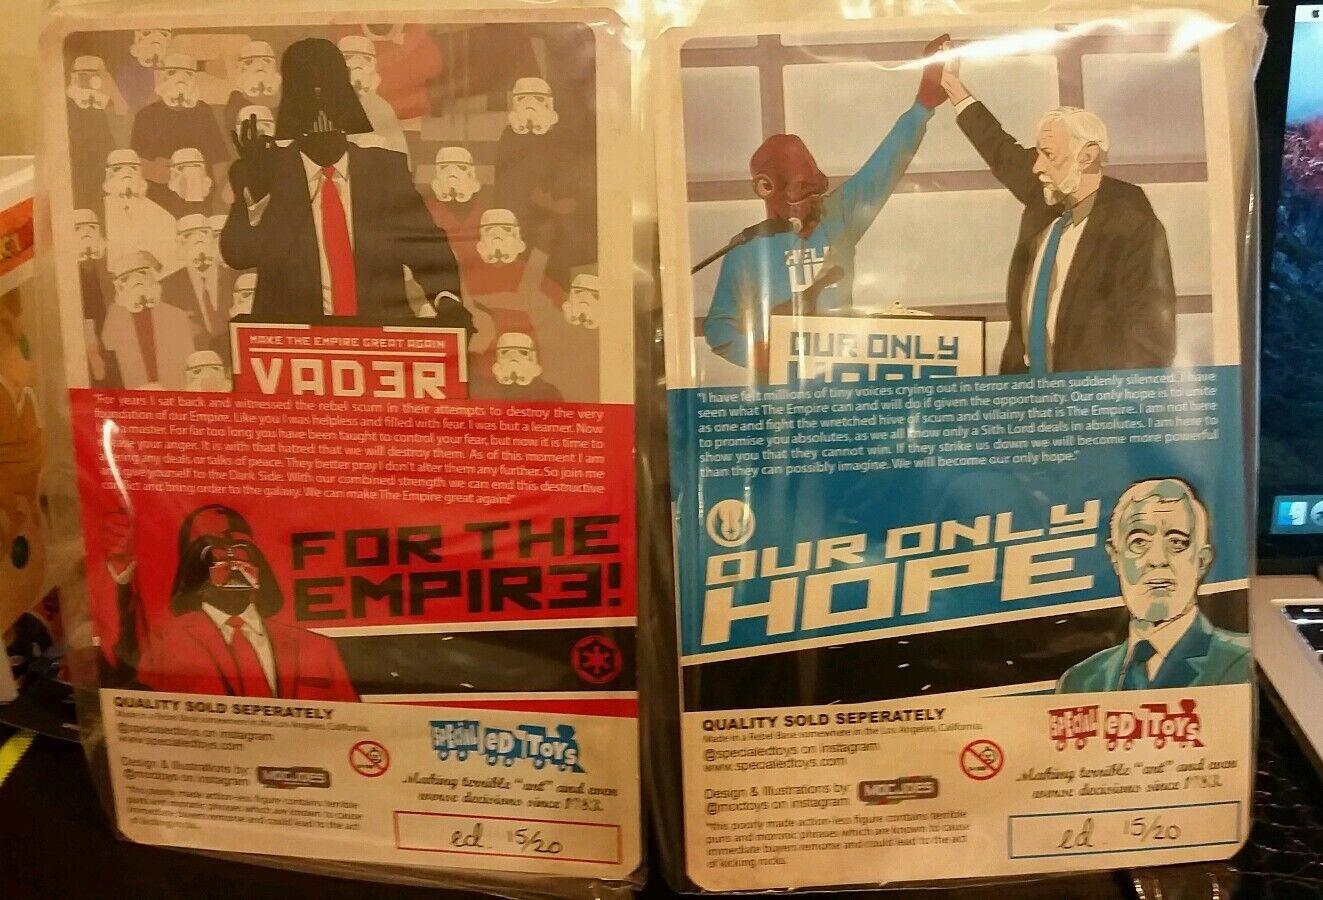 NYCC 2016 Exclusive DKE Our Only Hope For The Empire Empire Empire Set 15 20  Estrella Guerras e2c496